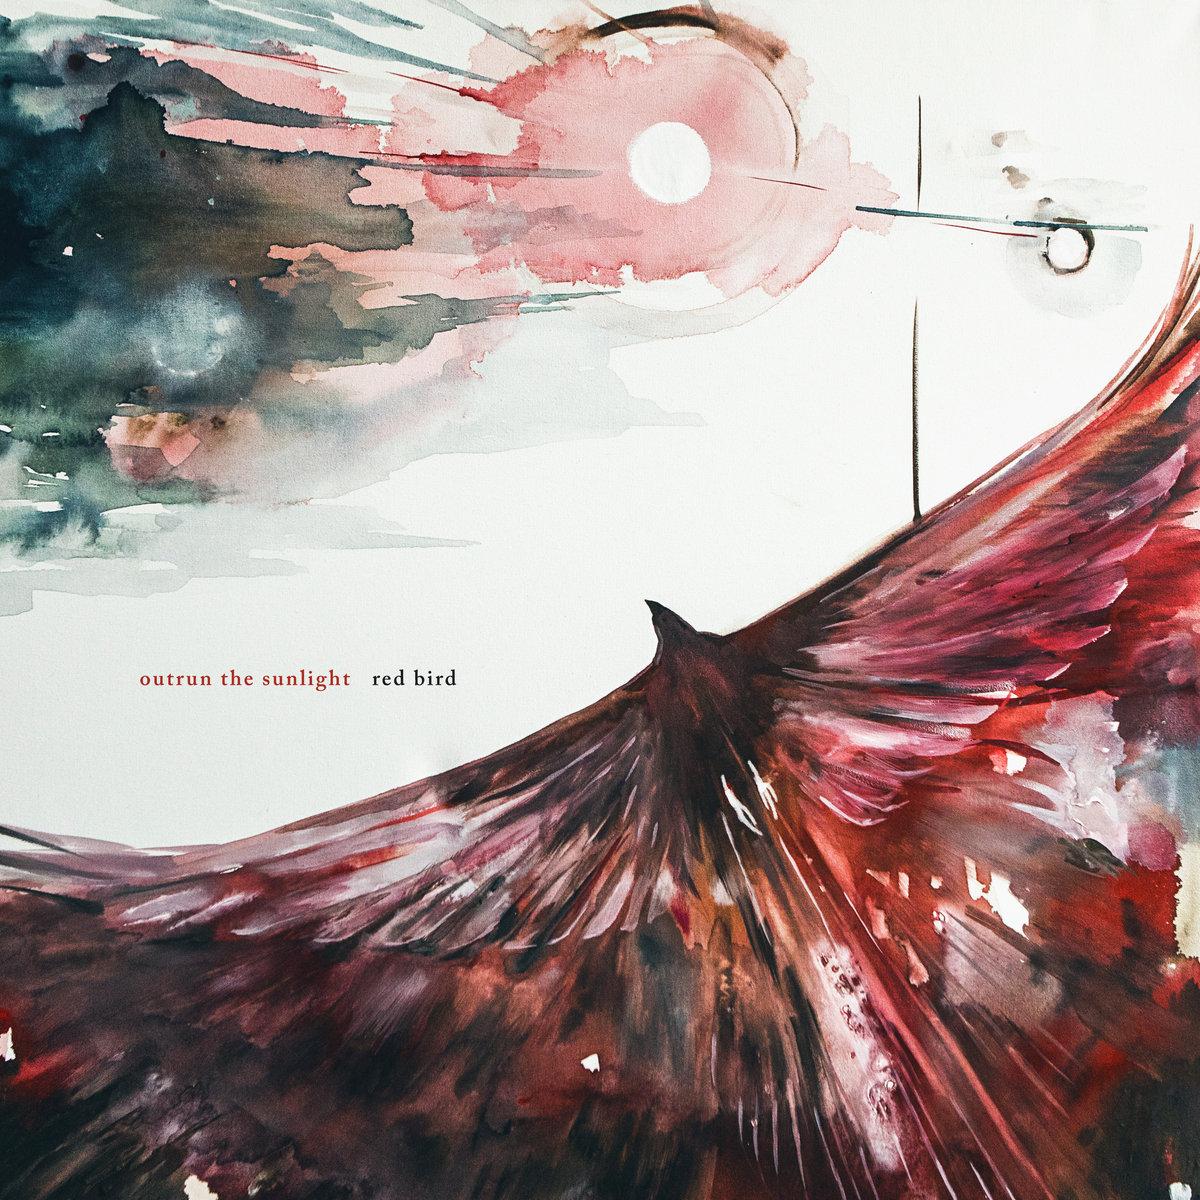 31. Outrun the Sunlignt - Red Bird